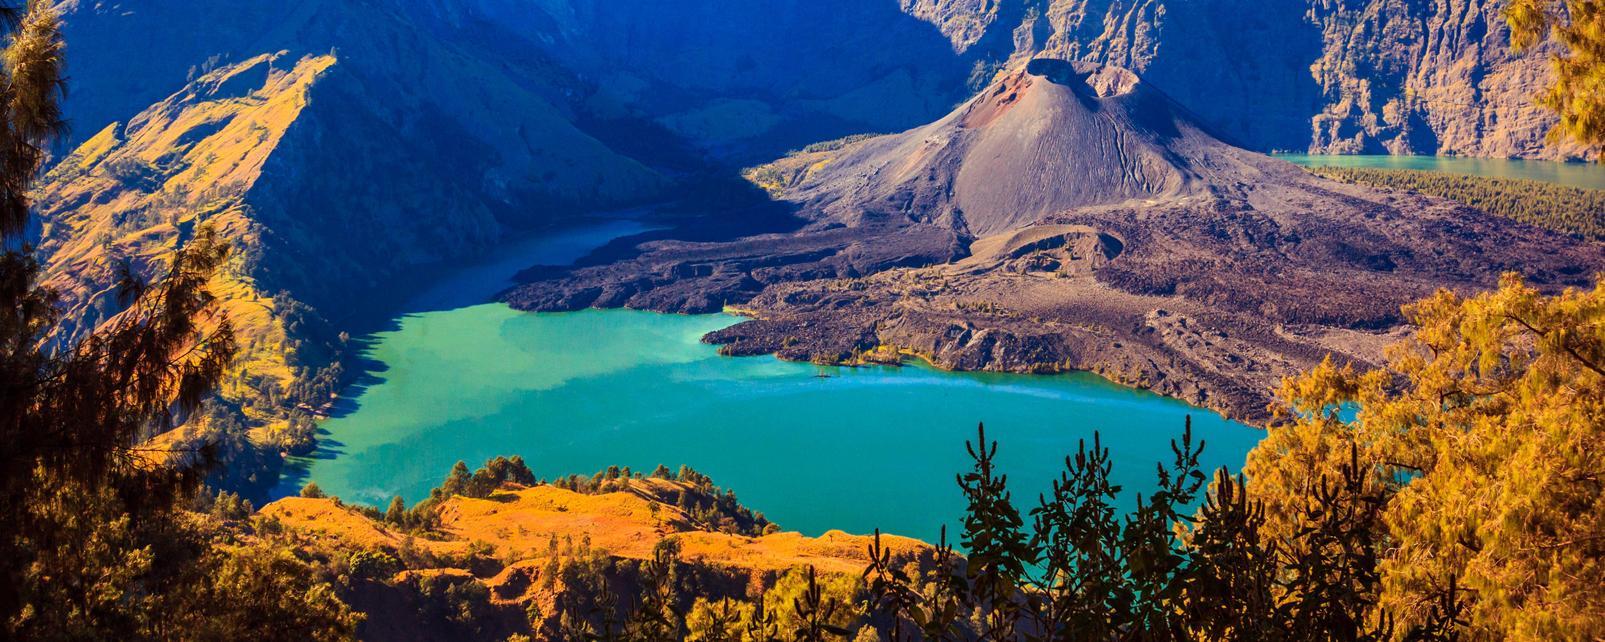 Asie, Indonésie, Lombok, Caldeira, Mont, Rinjani, lac, montagne,